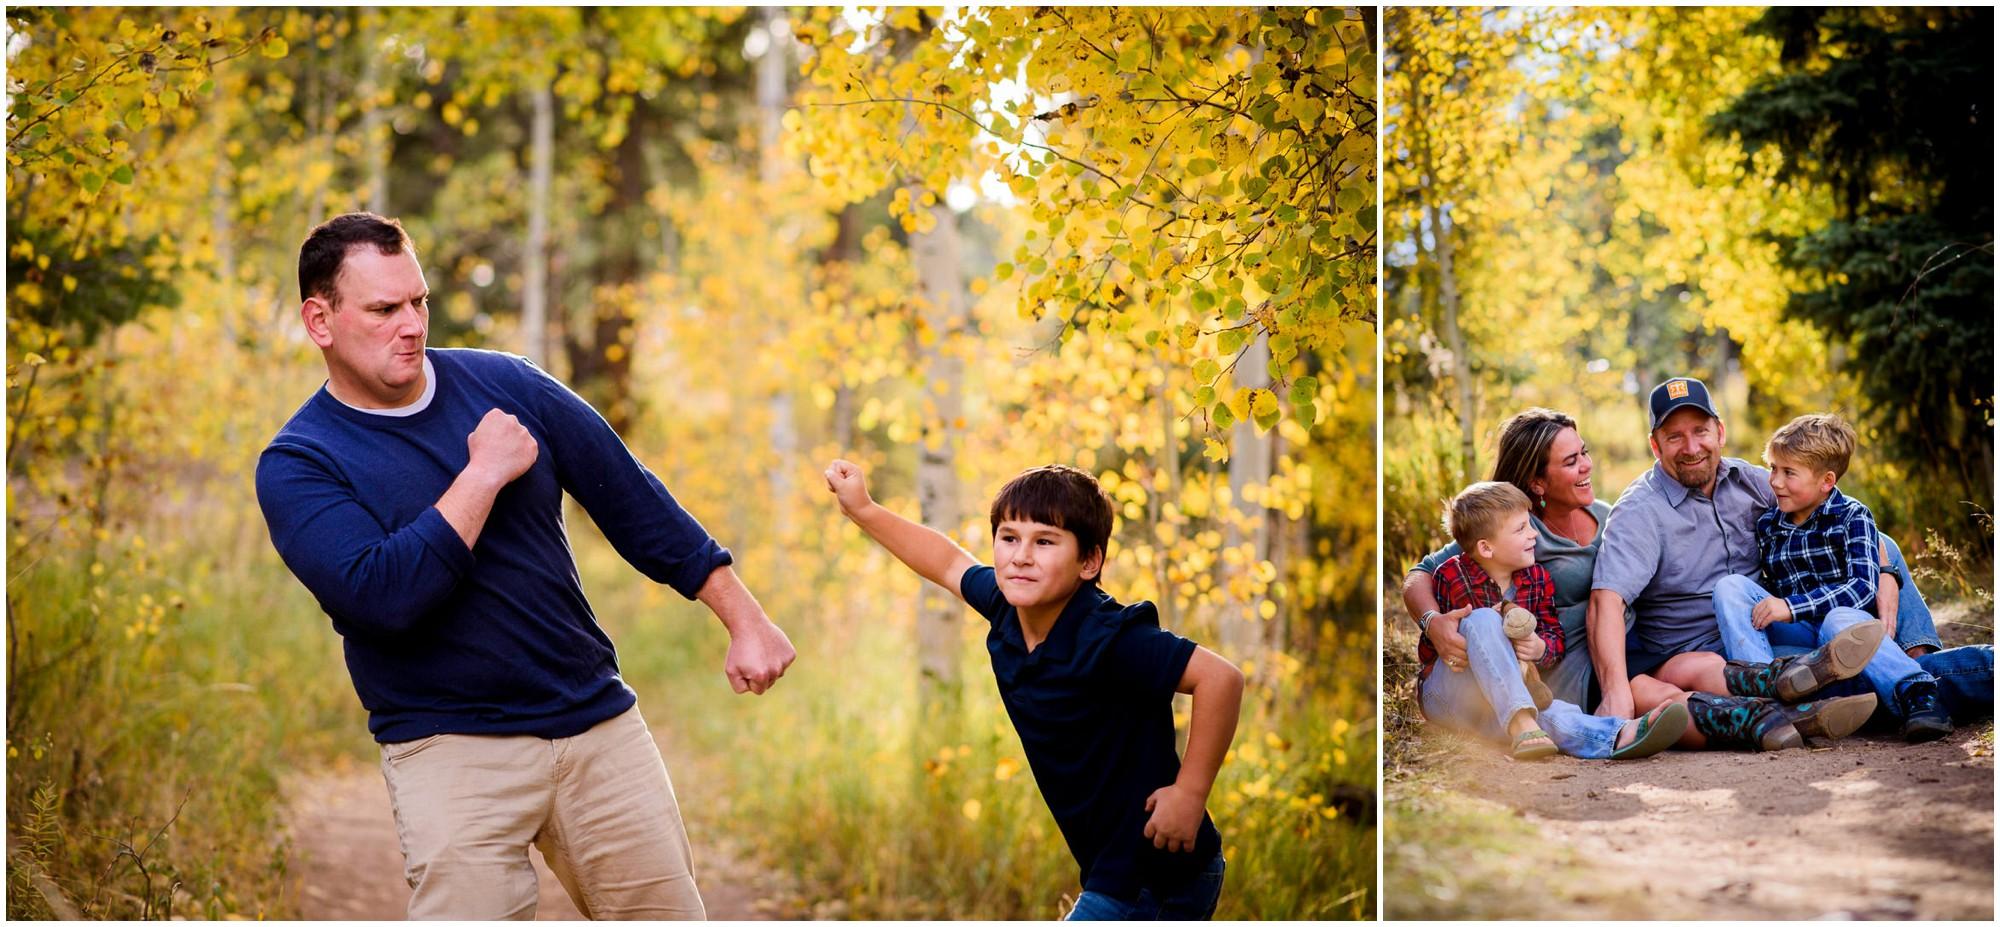 71-Meyer-ranch-fall-family-photography-reinstein.jpg